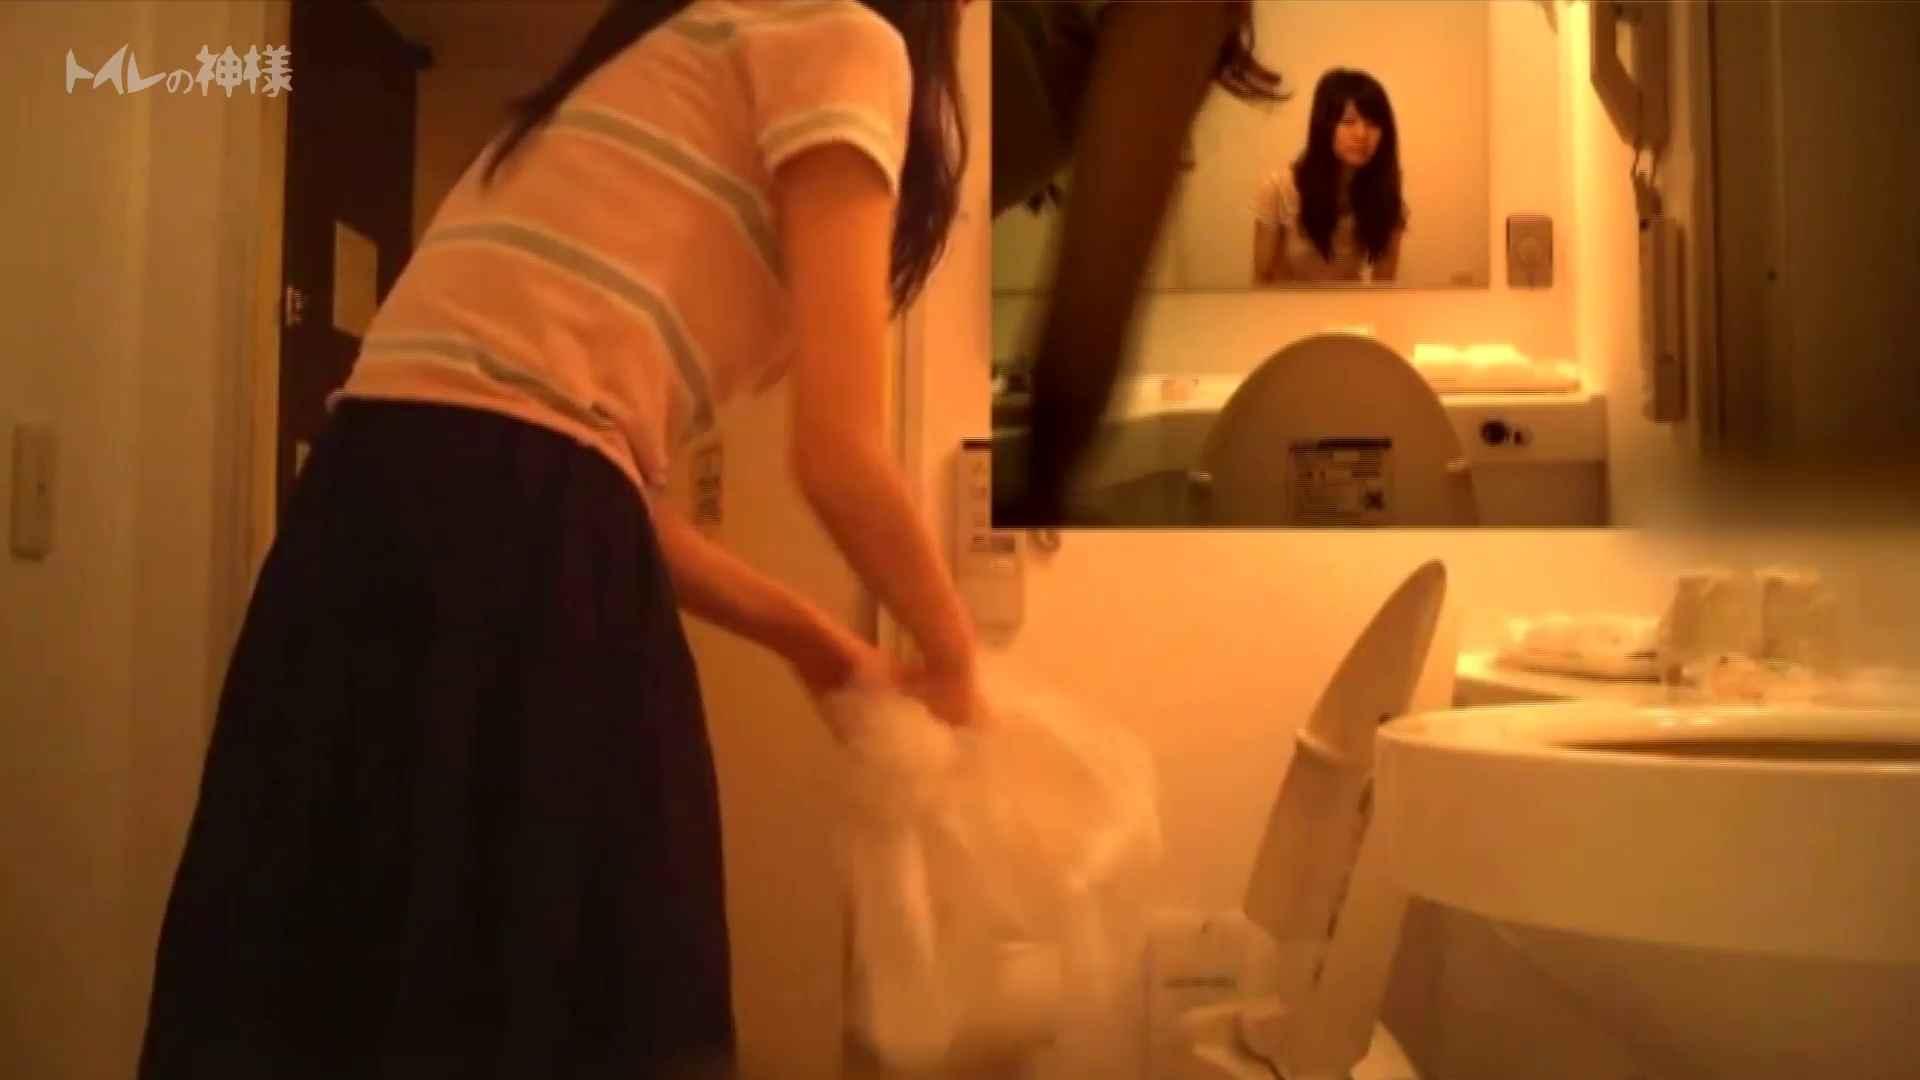 Vol.04 女子大生のトイレ恥態 トイレ盗撮  92枚 36